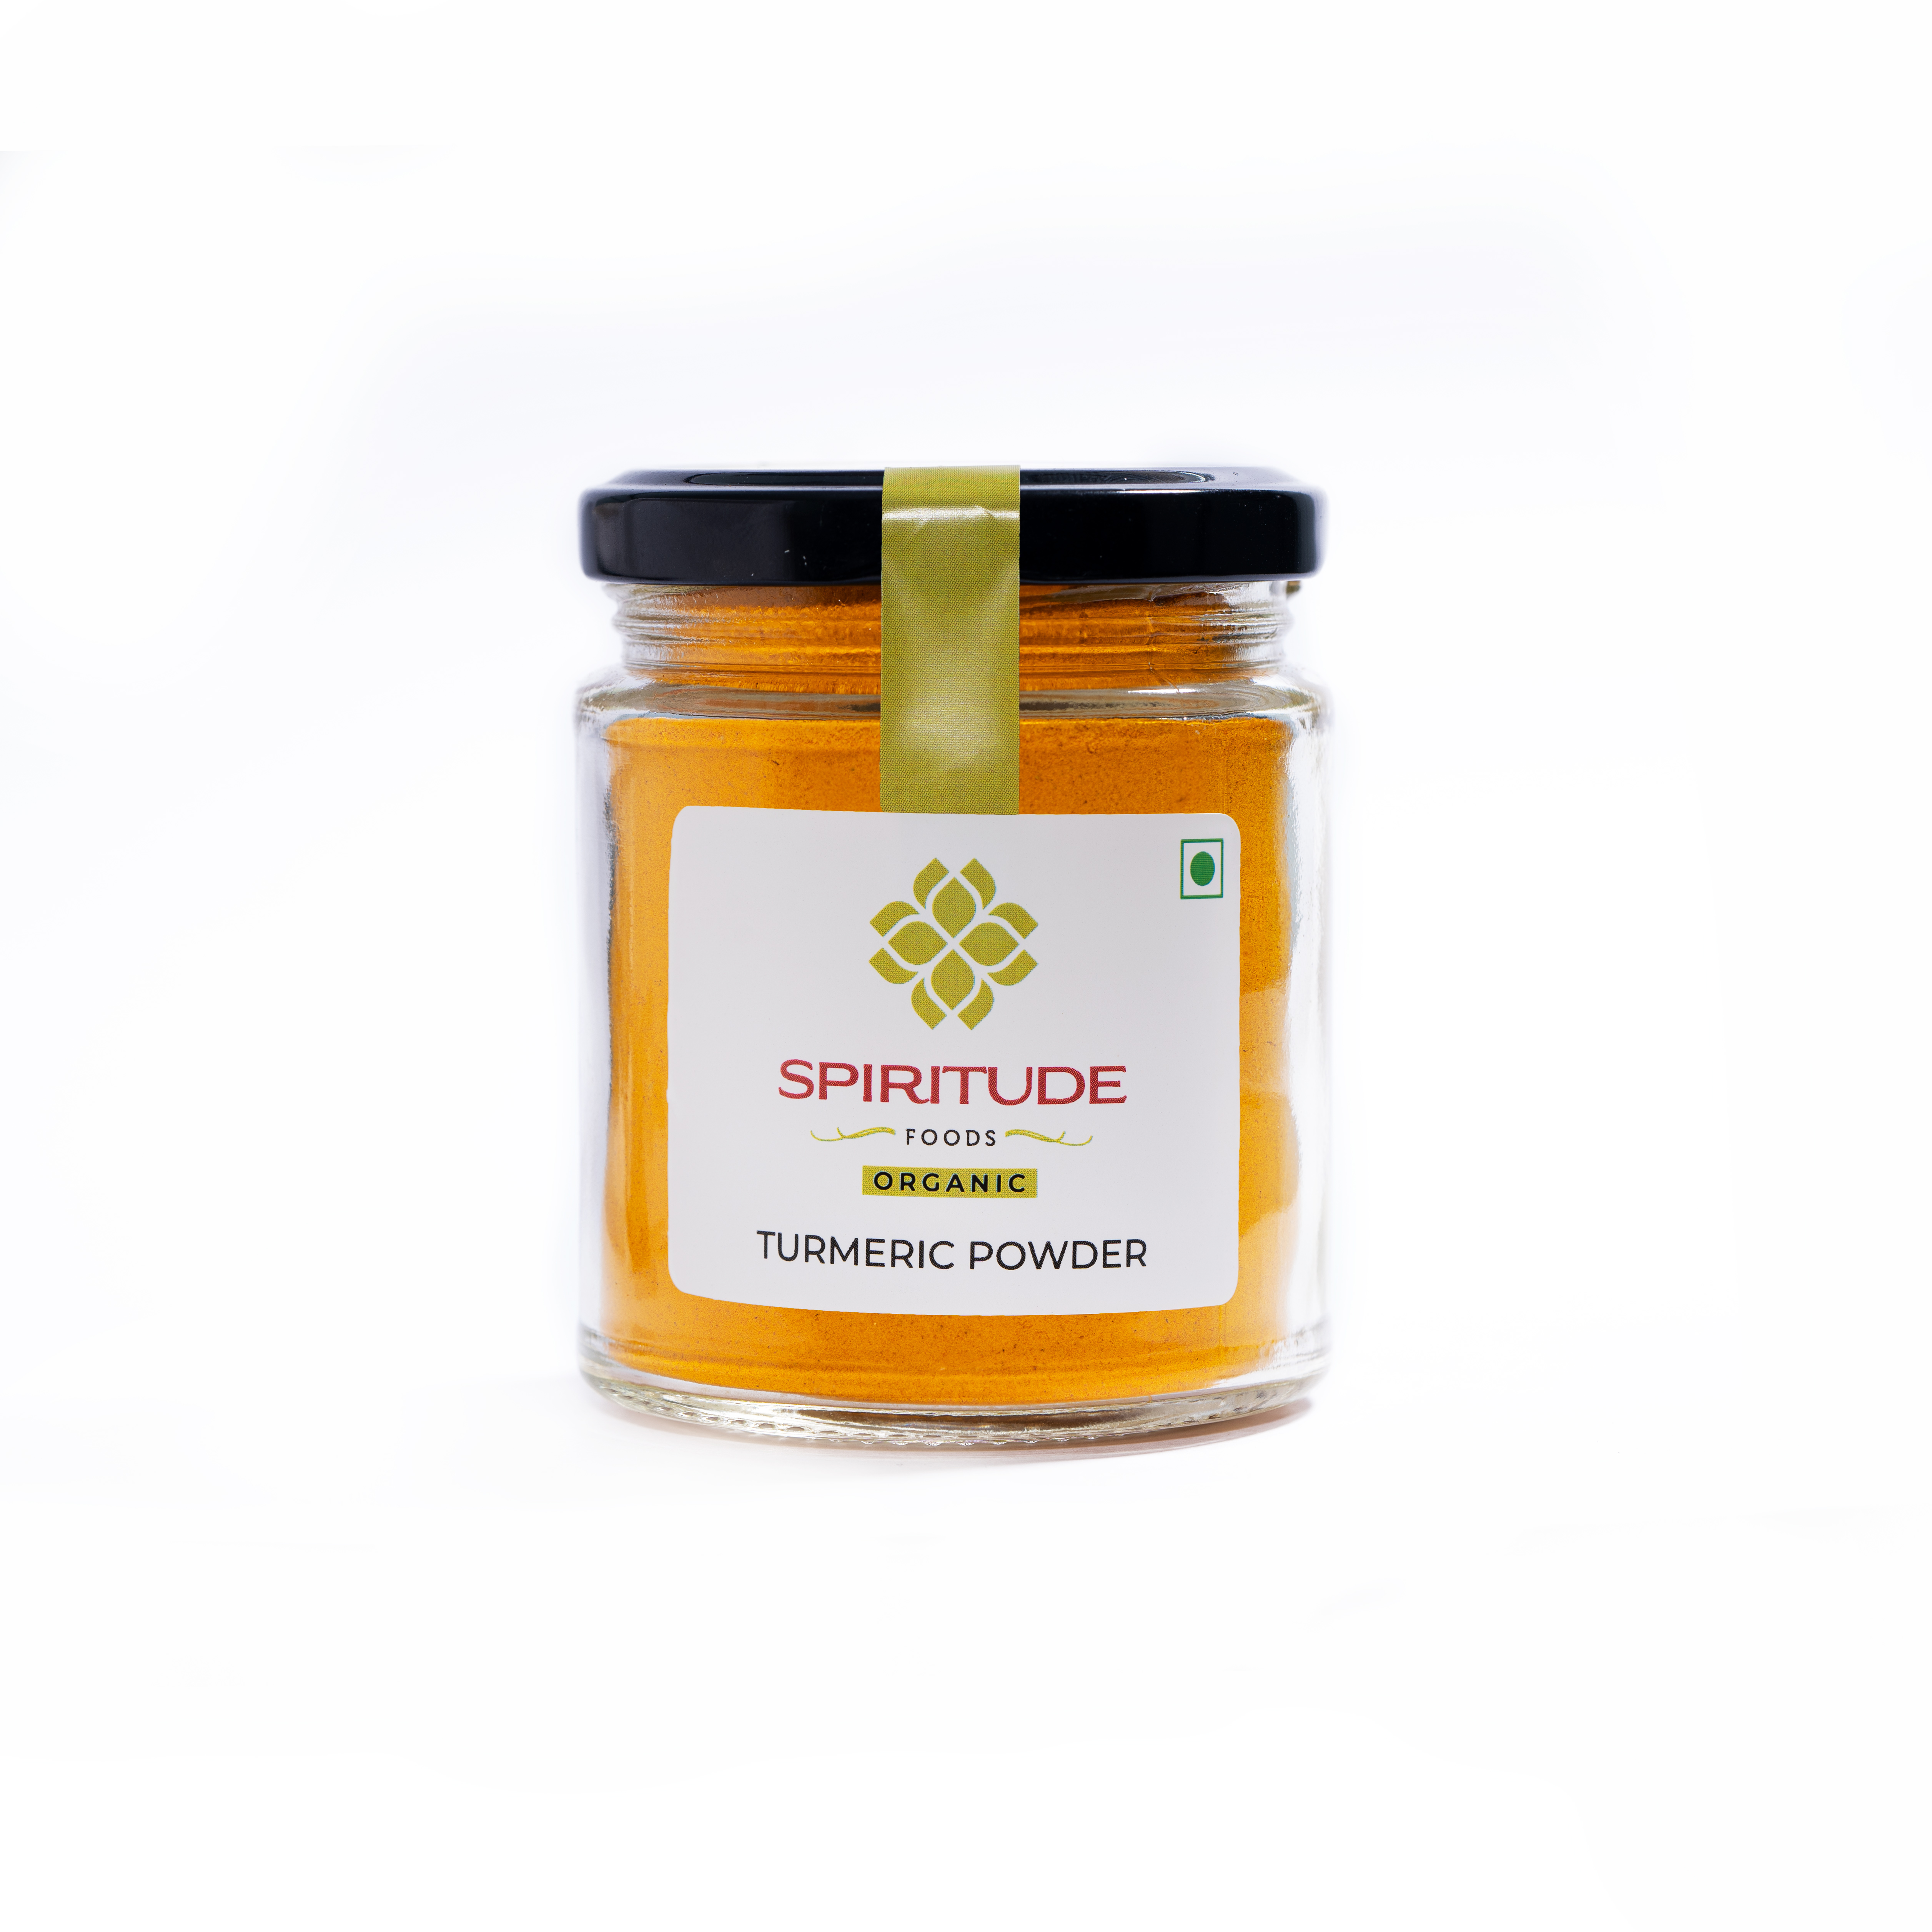 Spiritude Organic Turmeric